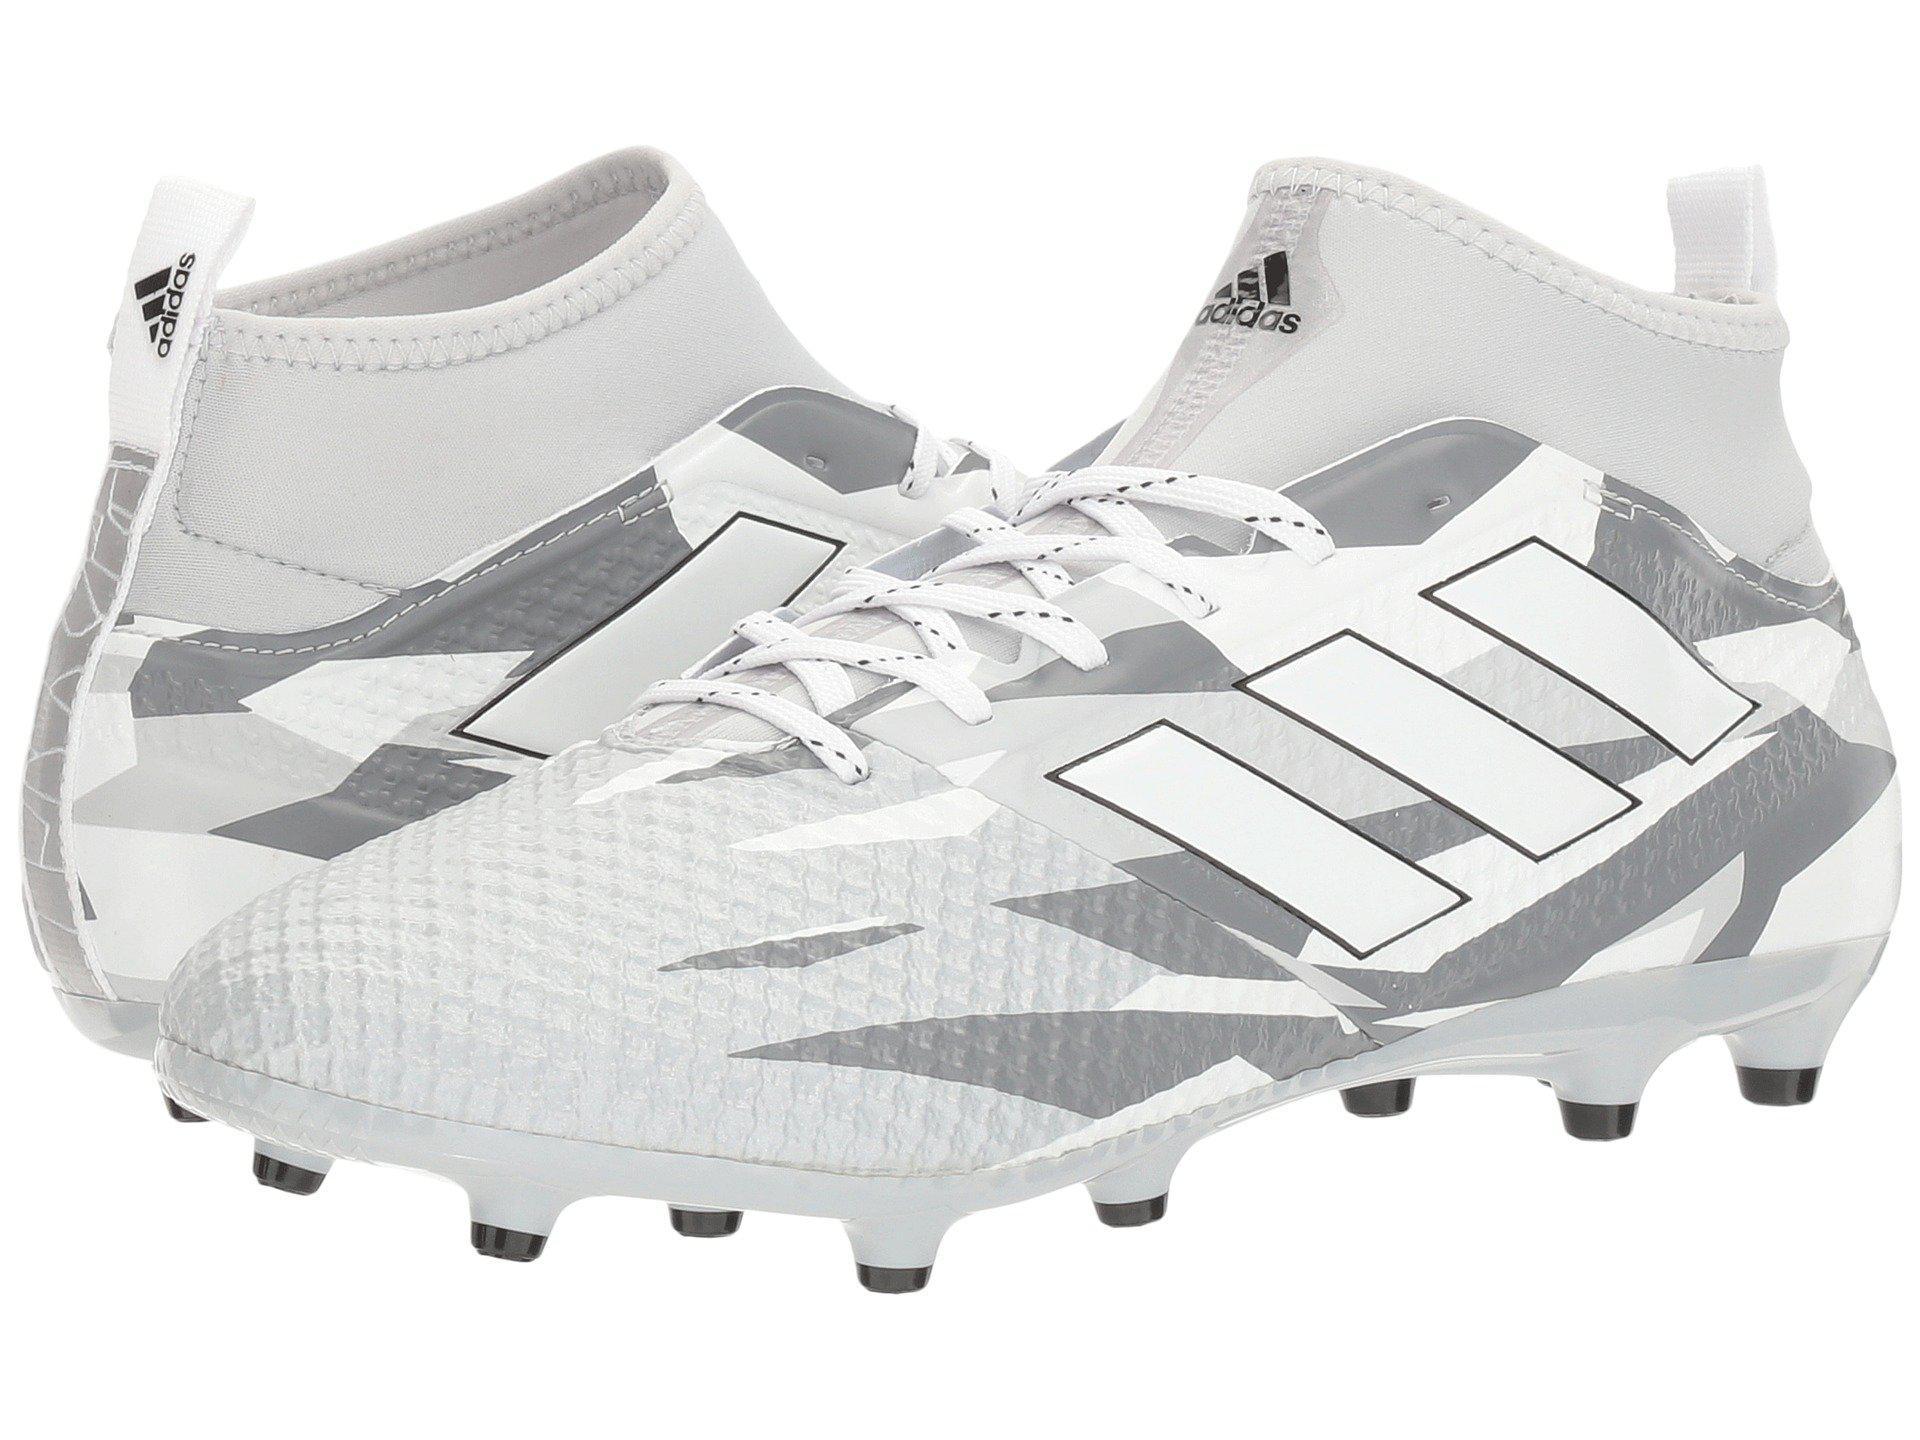 698679c6fddb Lyst - Adidas Ace 17.3 Primemesh Fg in White for Men